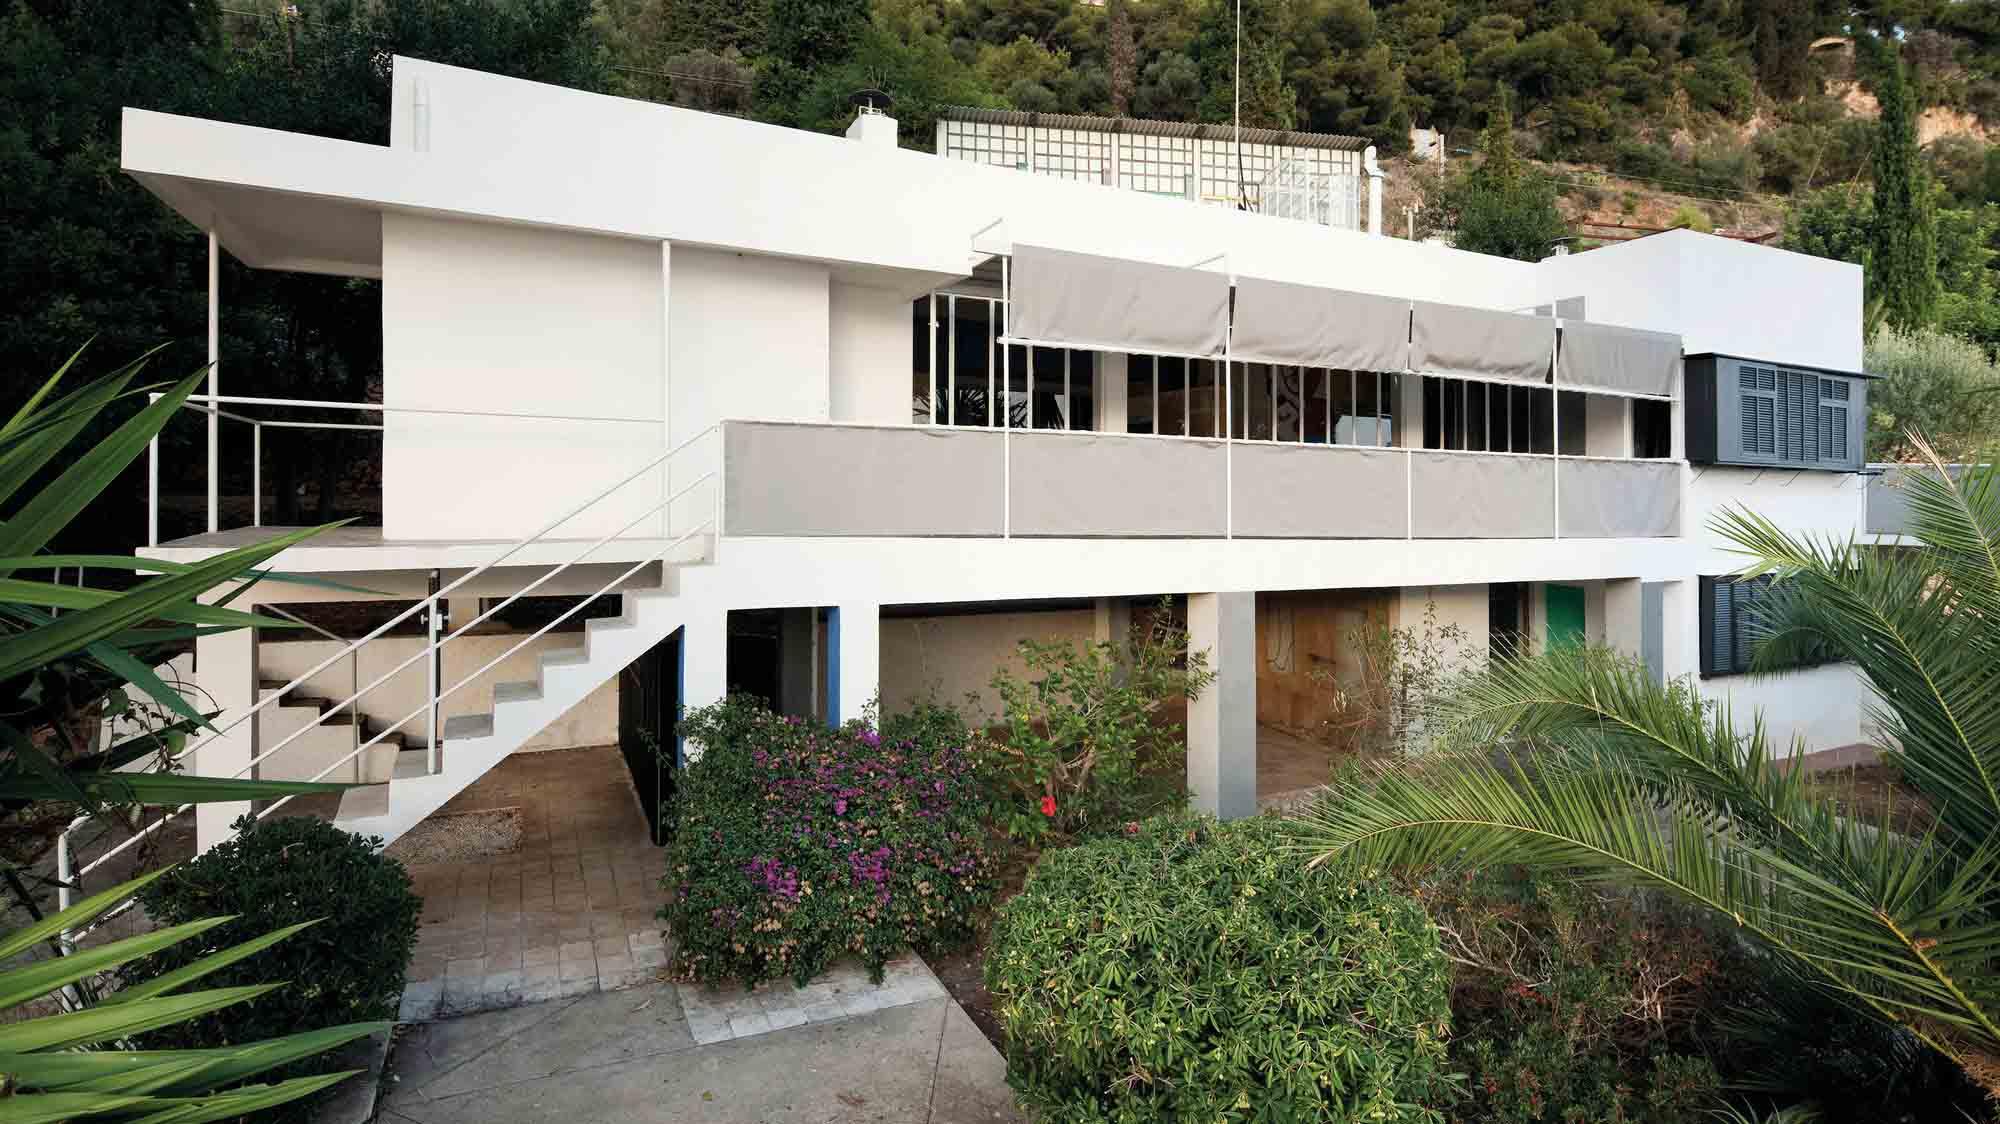 Eileen Gray blog - immagine 3 fronte villa